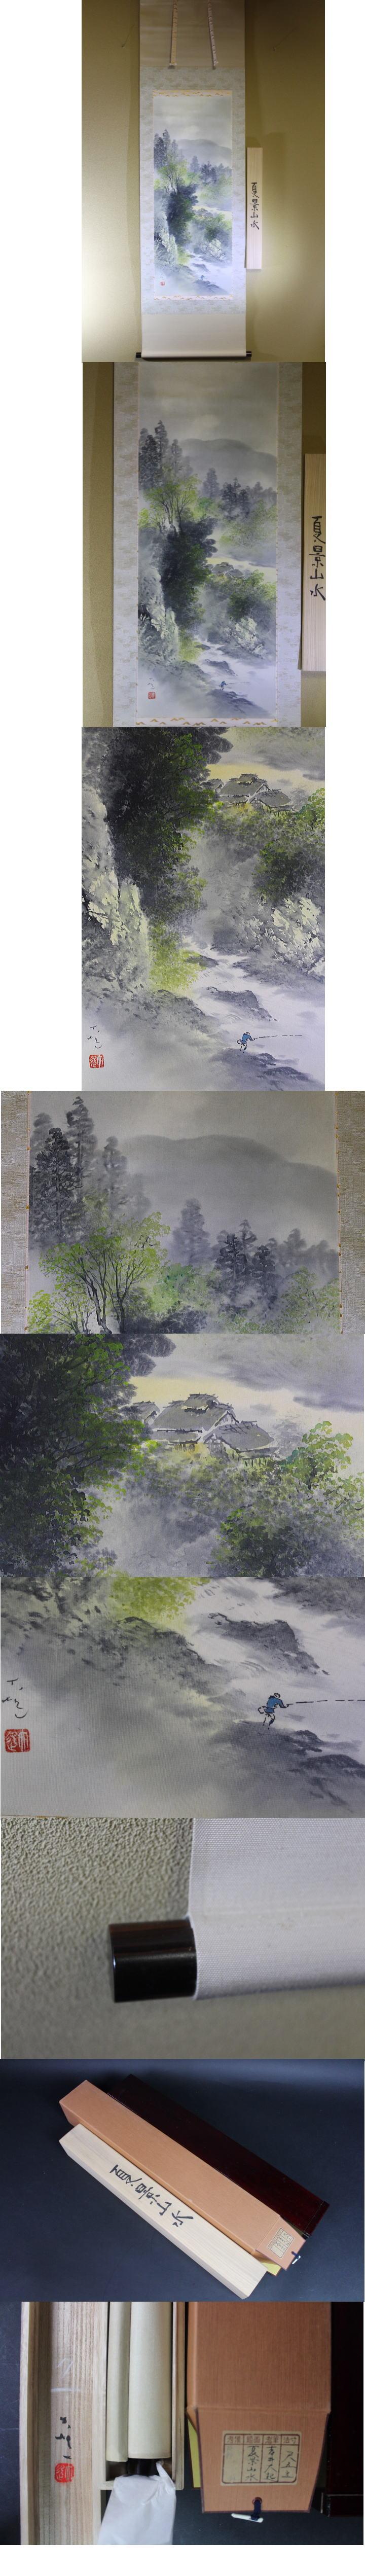 natusannsuijiku